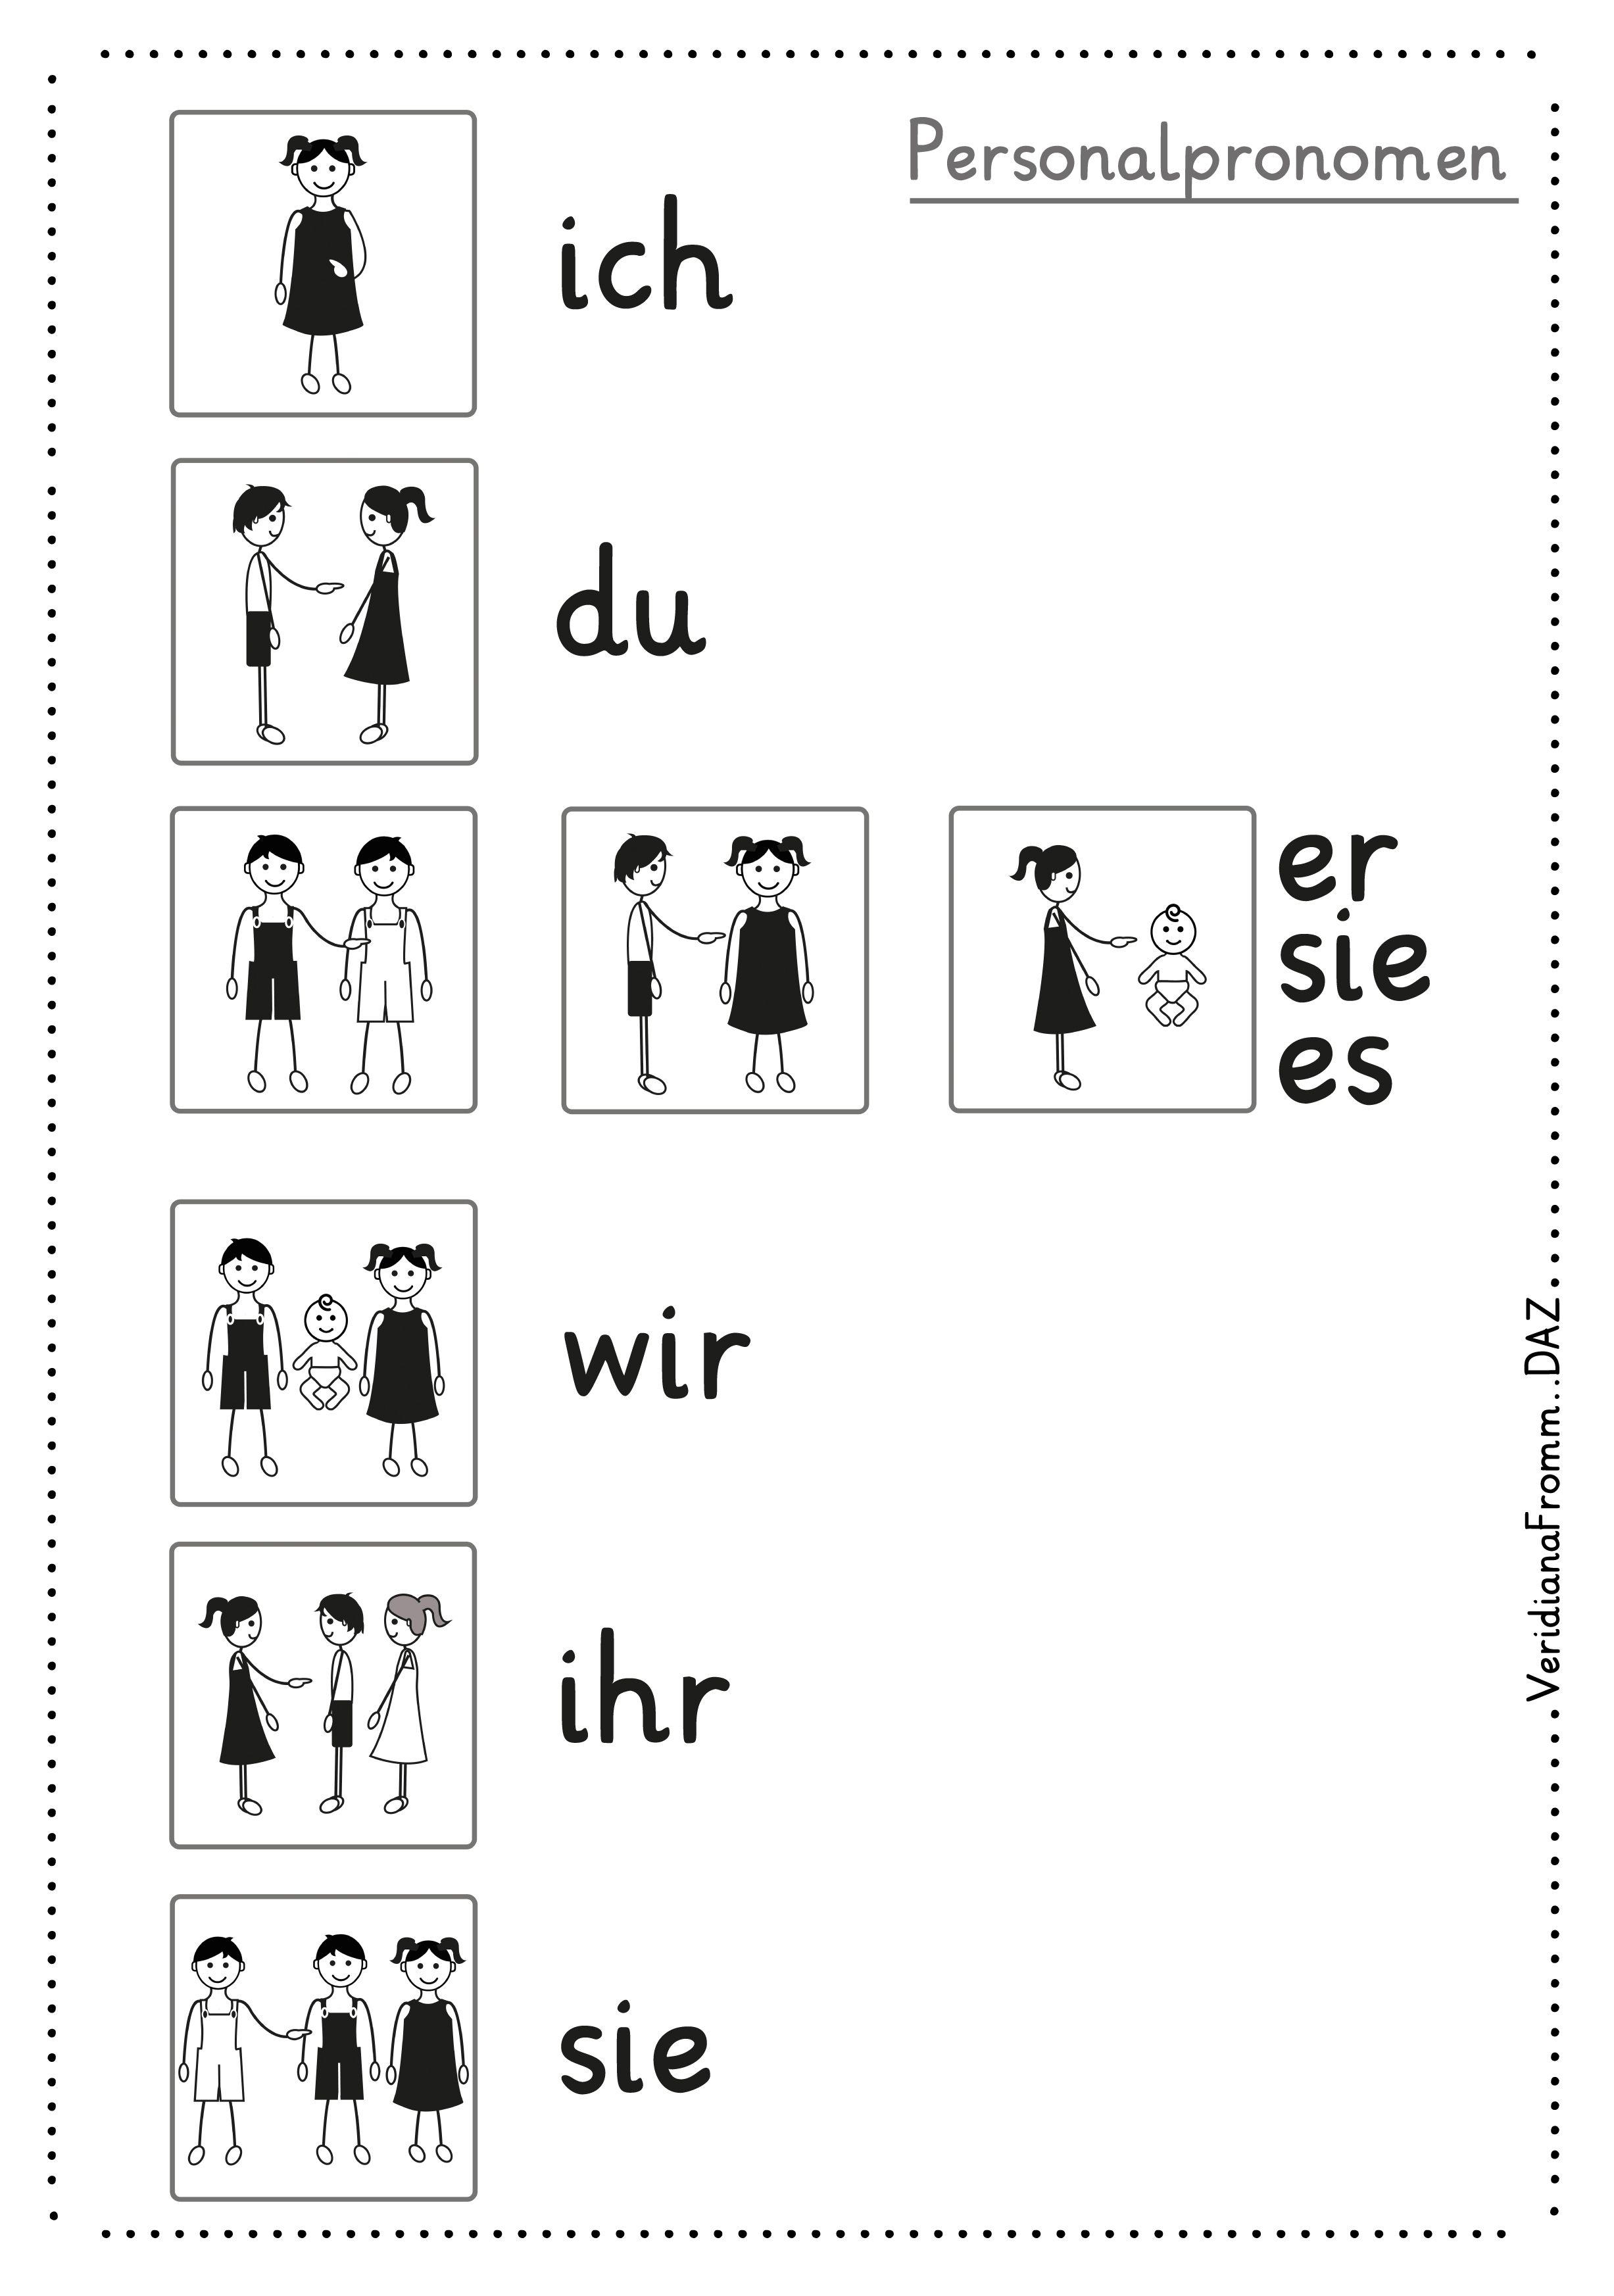 Personel Pronouns Pronom Personnel Personalpronomen Mit